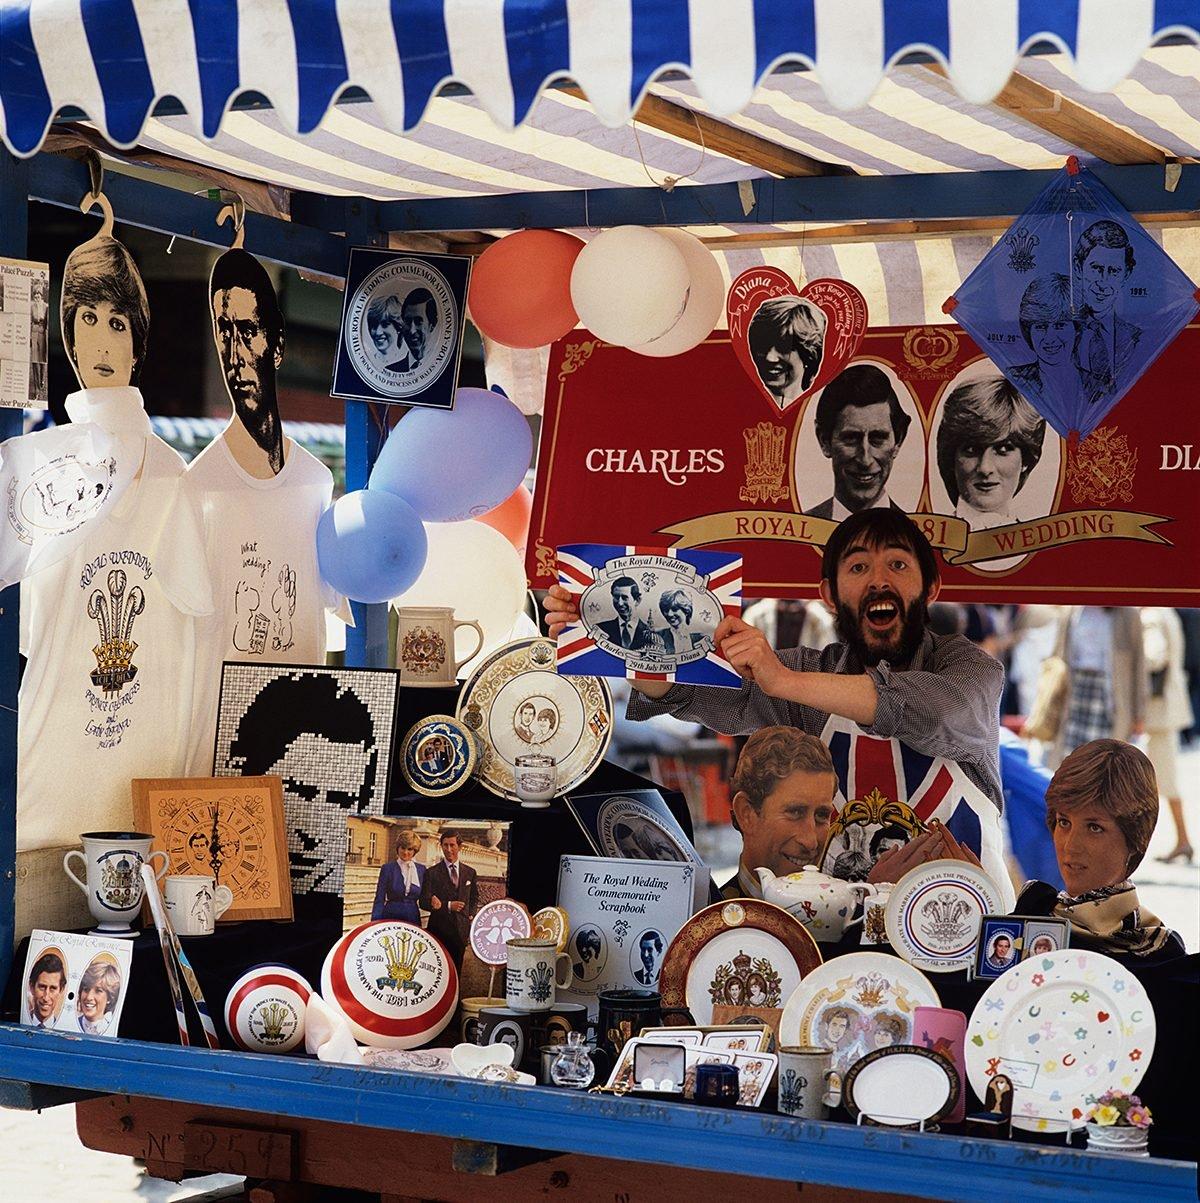 Prince Charles and Princess Diana wedding souvenirs